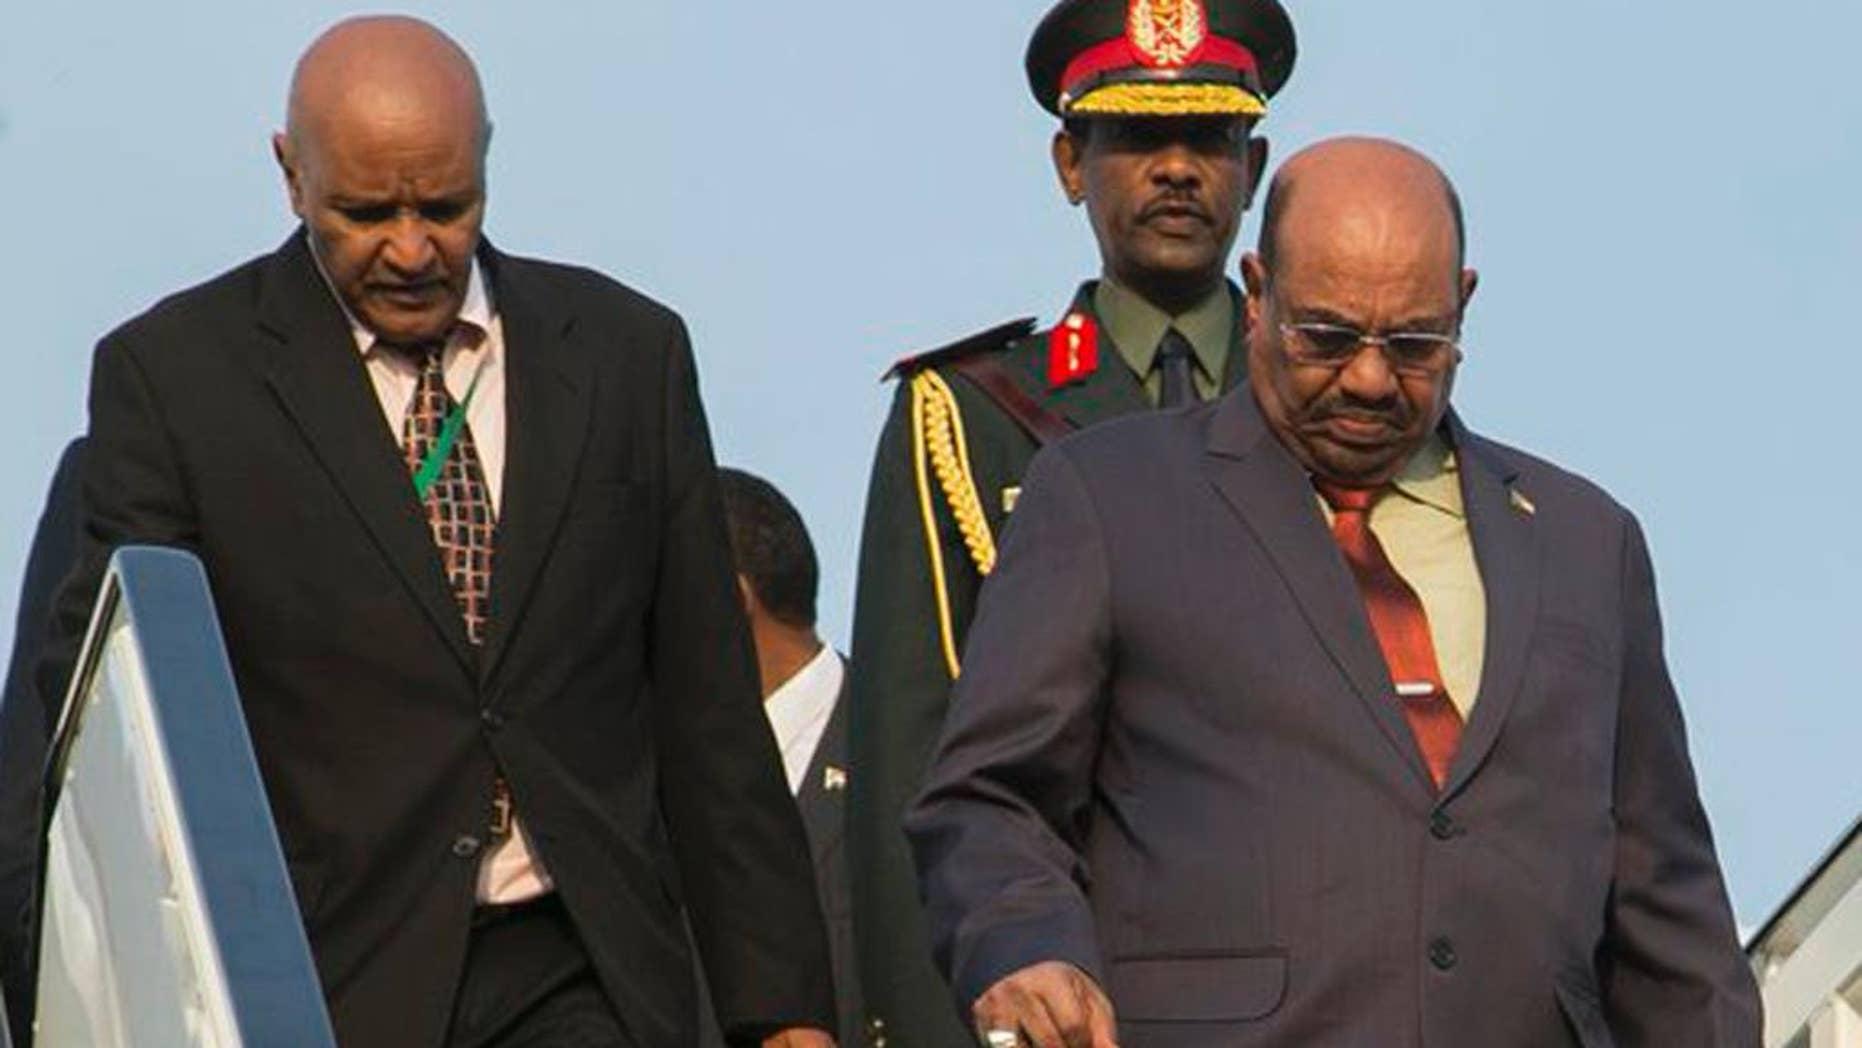 Sudan president Omar al-Bashir, right, arrives in Kigali, capital of Rwanda, Saturday, July 16, 2016. Al-Bashir arrived in Rwanda to attend a summit of African leaders, defying an international warrant of arrest after public assurances from Rwandan leaders that he would not be arrested. (AP Photo/Ssuuna katera)